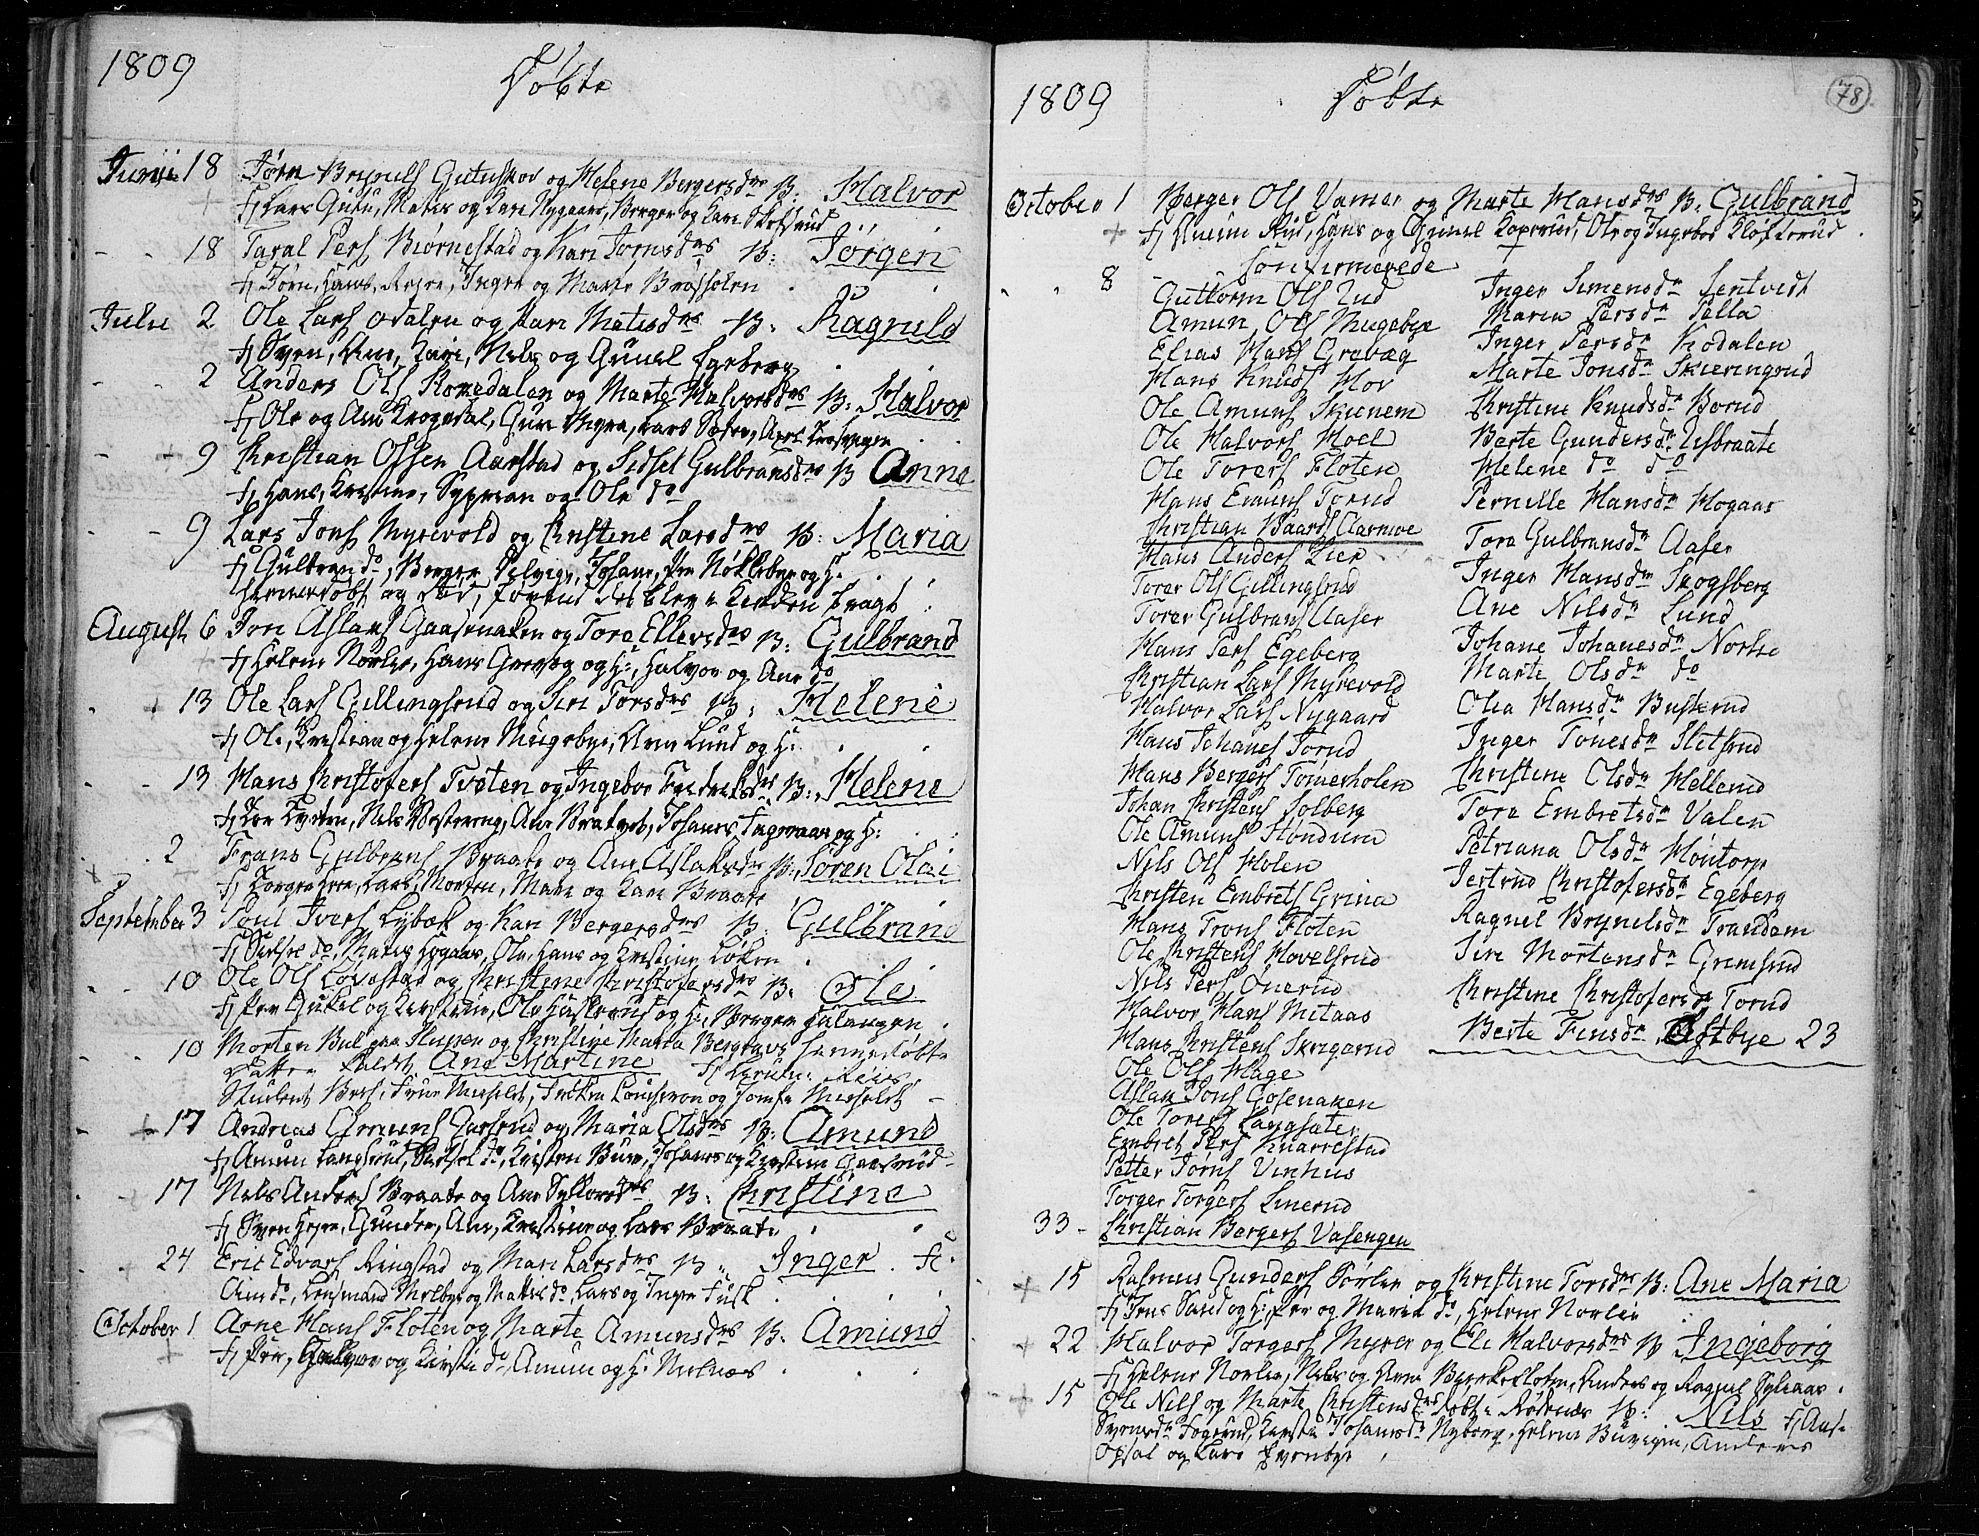 SAO, Trøgstad prestekontor Kirkebøker, F/Fa/L0005: Ministerialbok nr. I 5, 1784-1814, s. 78